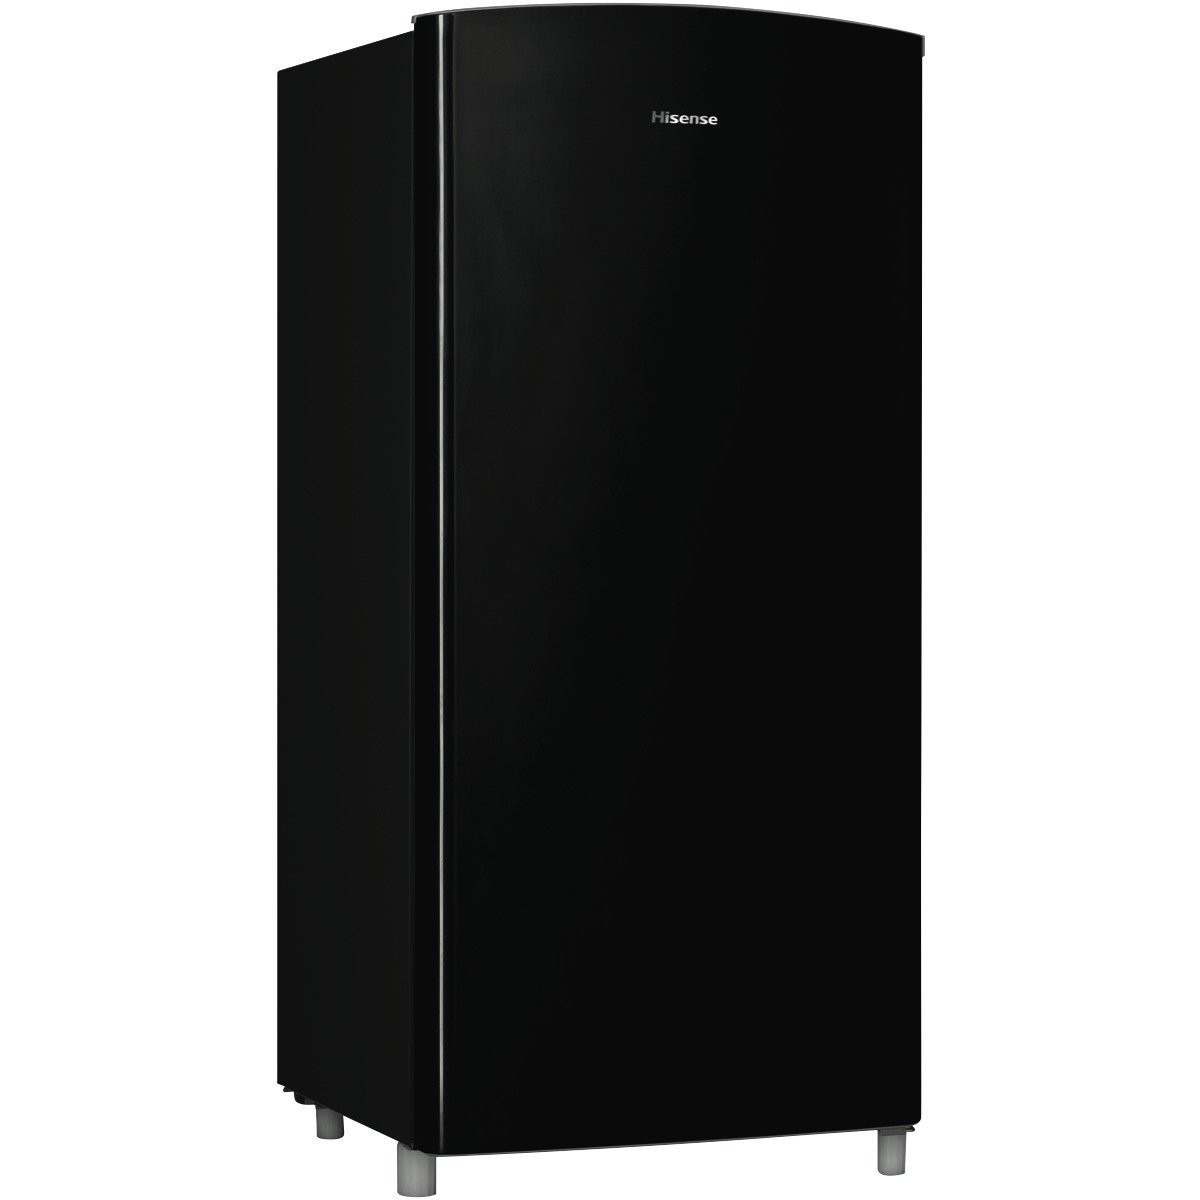 Hisense HR6BF157B Refrigerator